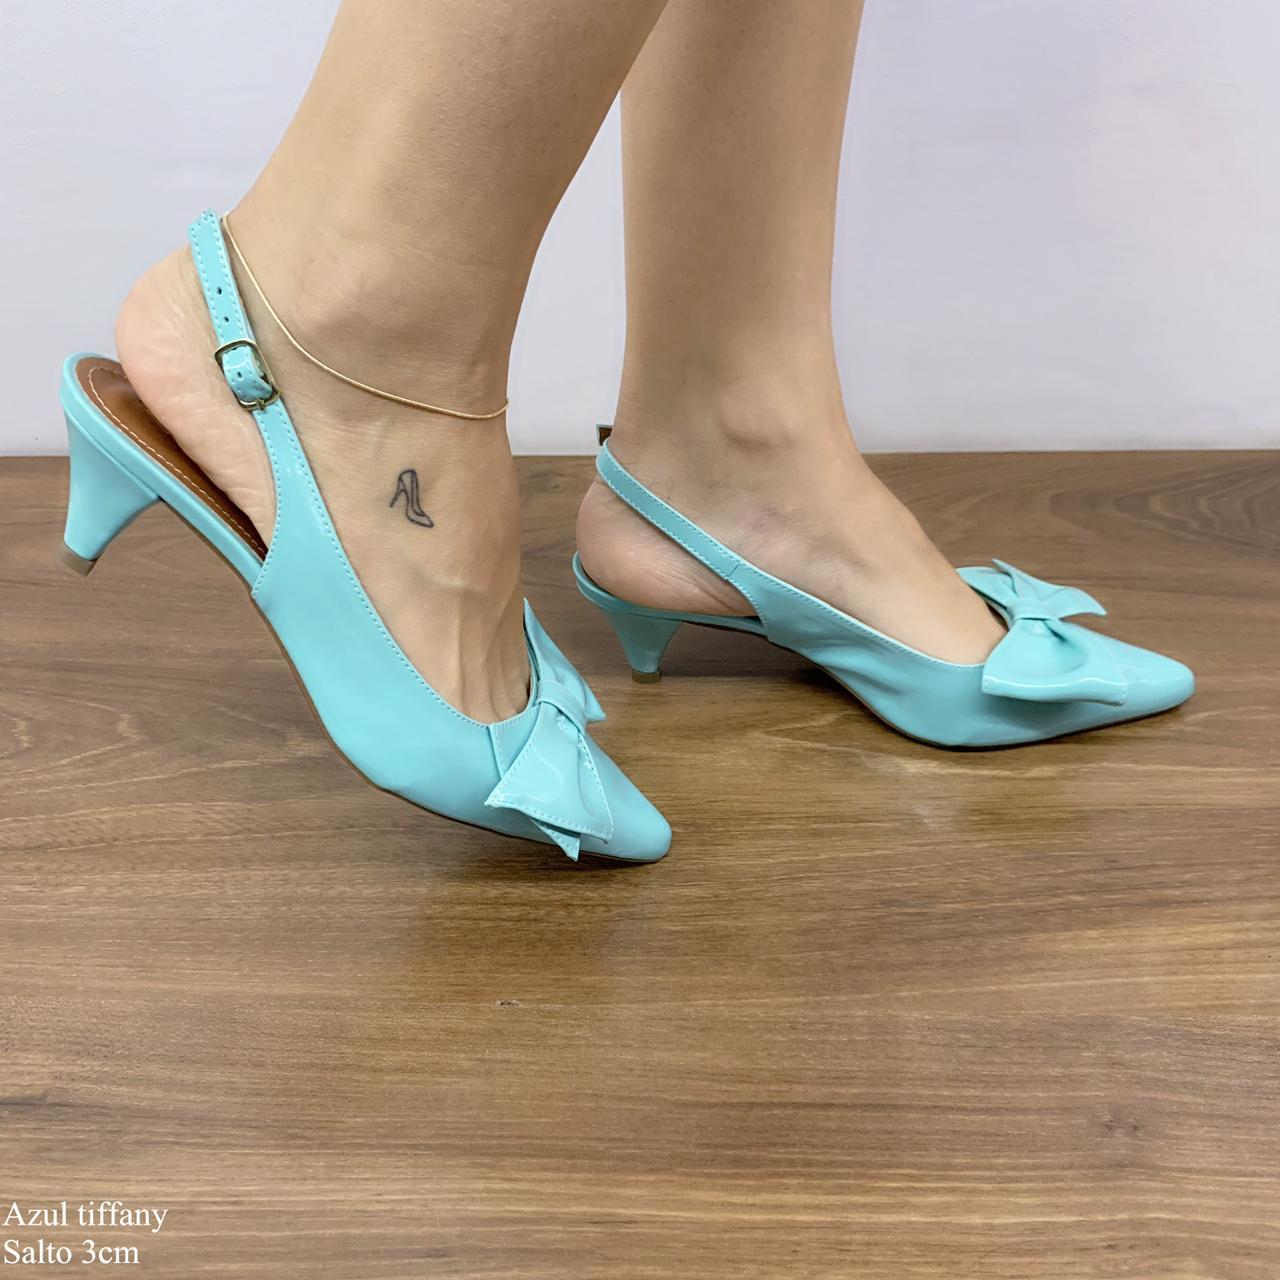 Scarpin Chanel Azul Tiffany | D-2021